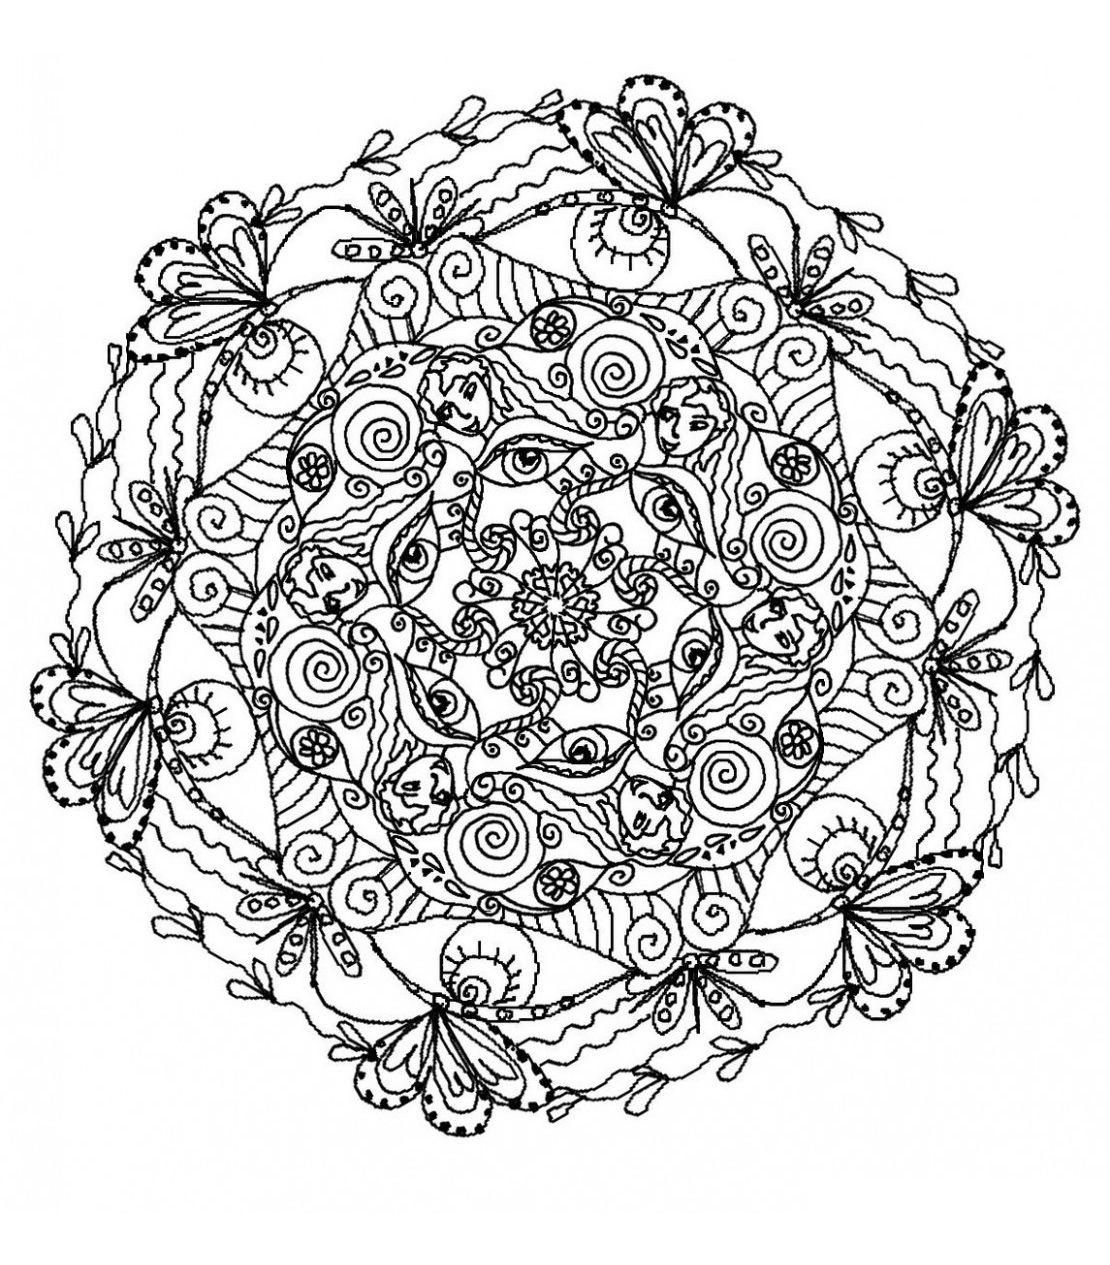 Coloriage Mandalas Coloriages Difficiles Pour Adultes Bloemen Kleurplaten Mandala Kleurplaten Gratis Kleurplaten